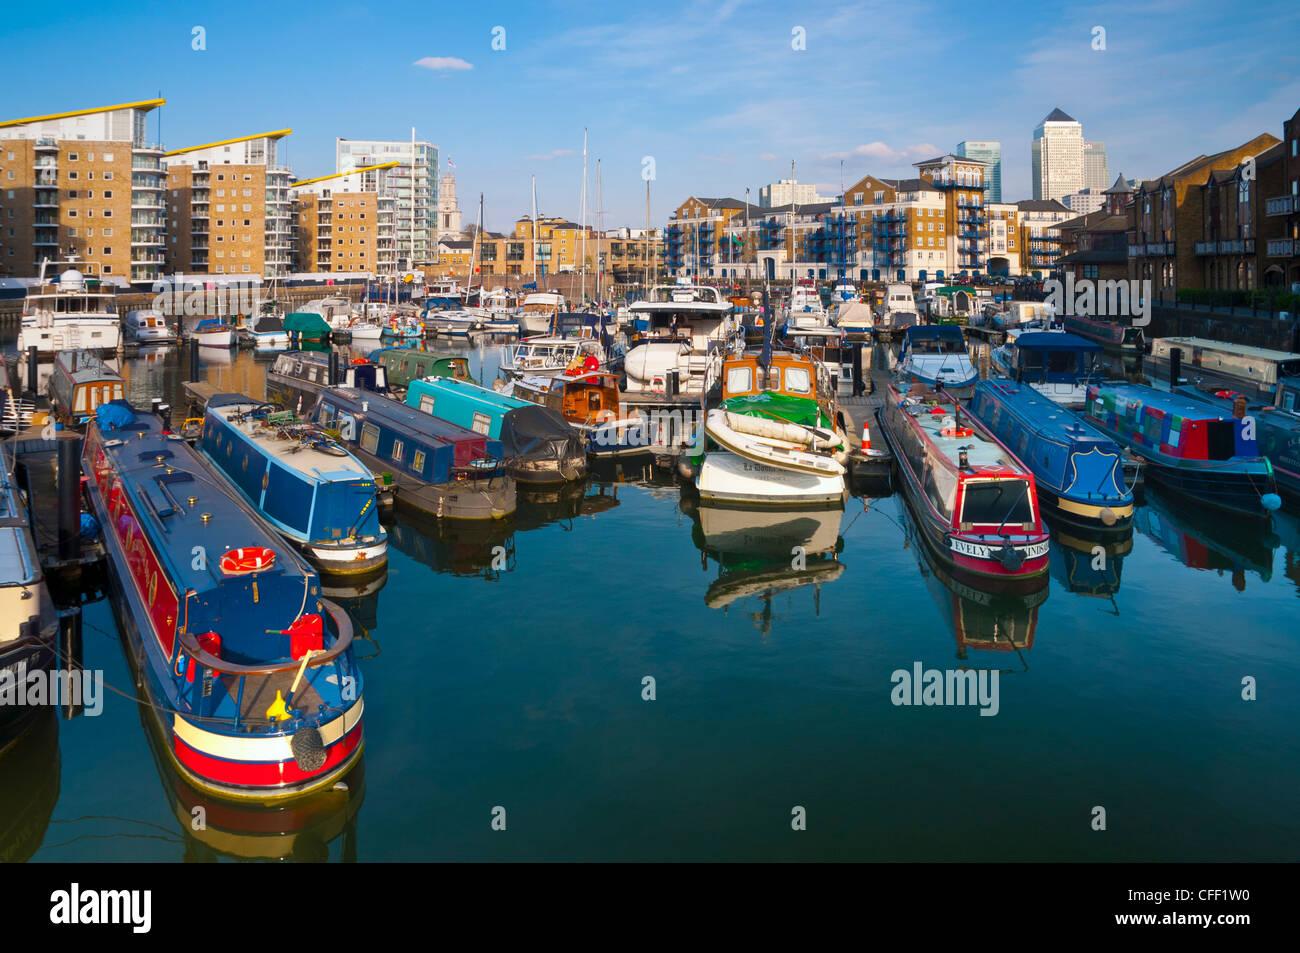 Limehouse Basin et au-delà de Canary Wharf, Londres, Angleterre, Royaume-Uni, Europe Photo Stock